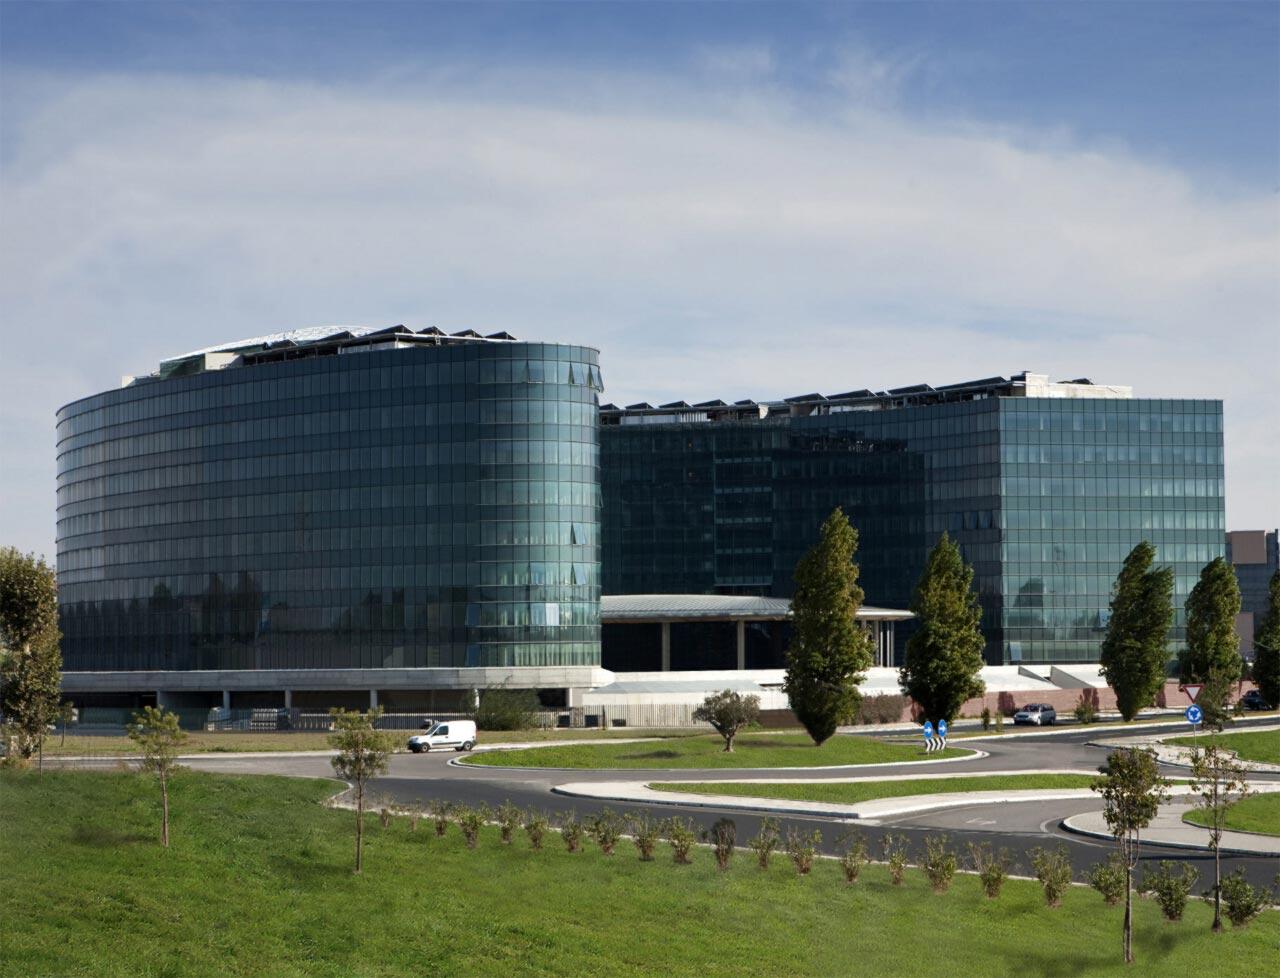 Da vinci business center roma 04 isa spa for Roma business center